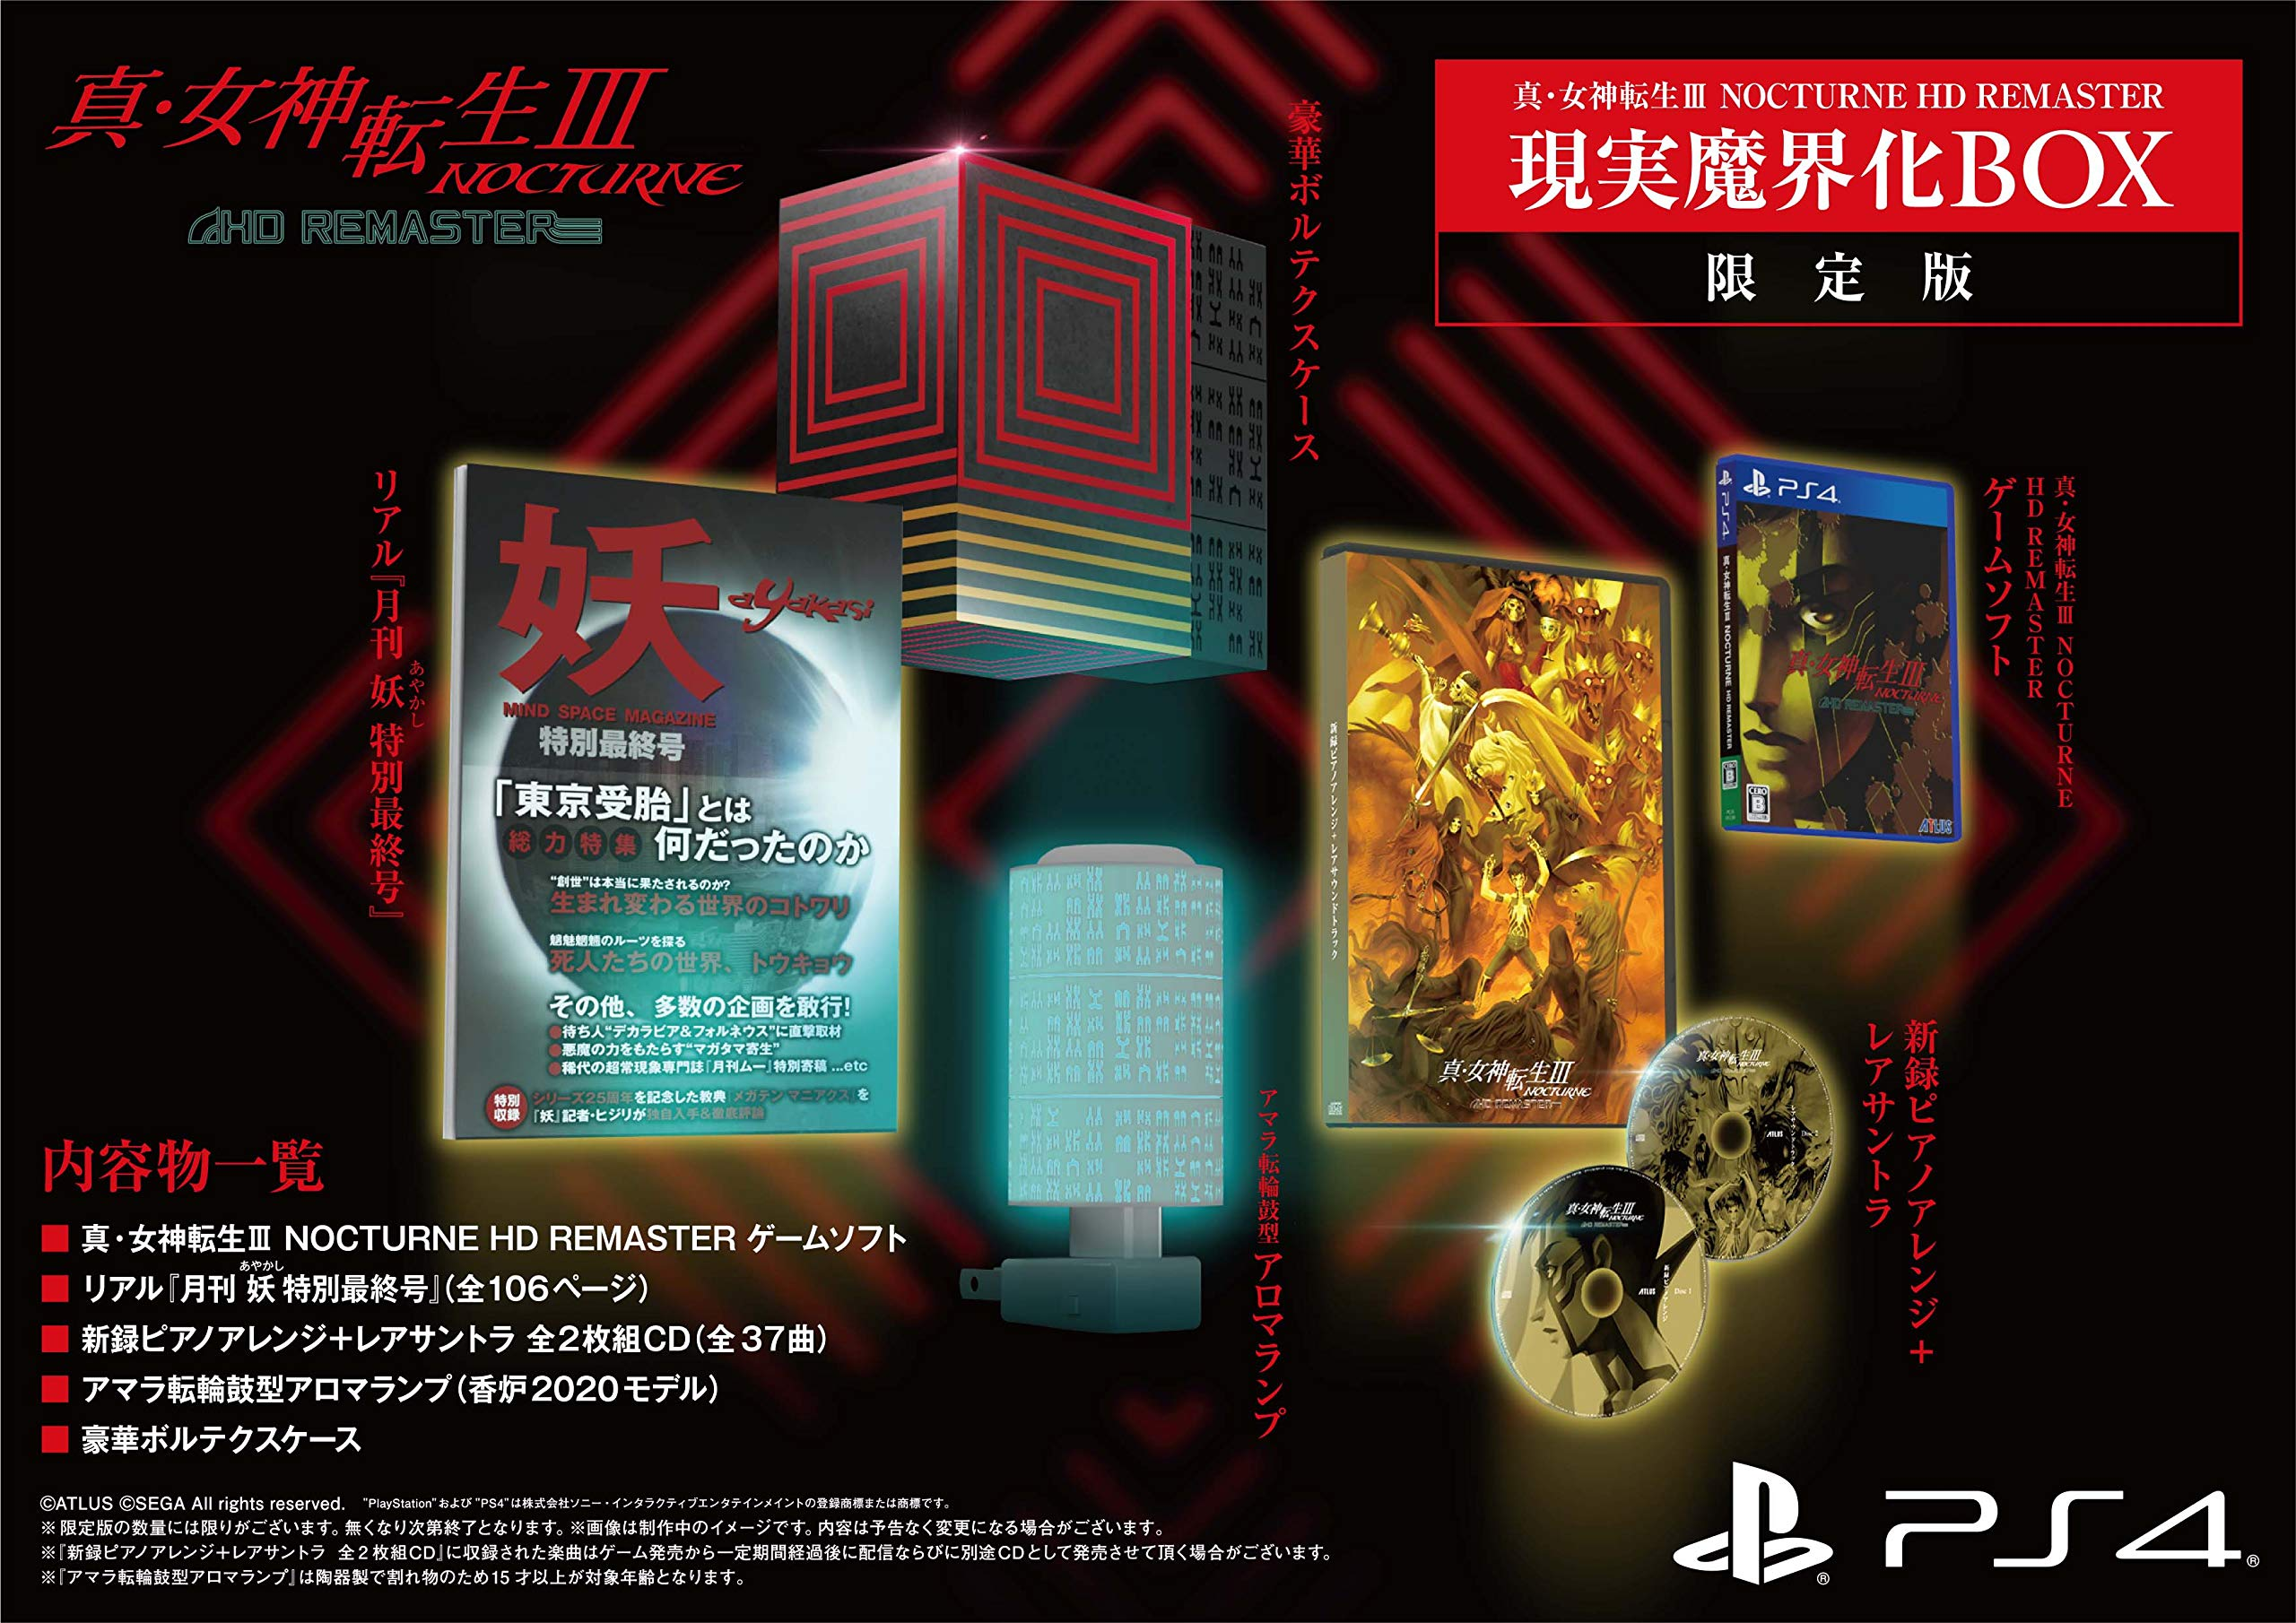 【PS4・Switch】『真・女神転生III NOCTURNE HD REMASTER』予約受付中!限定版 現実魔界化BOX・店舗特典【10月29日発売!】